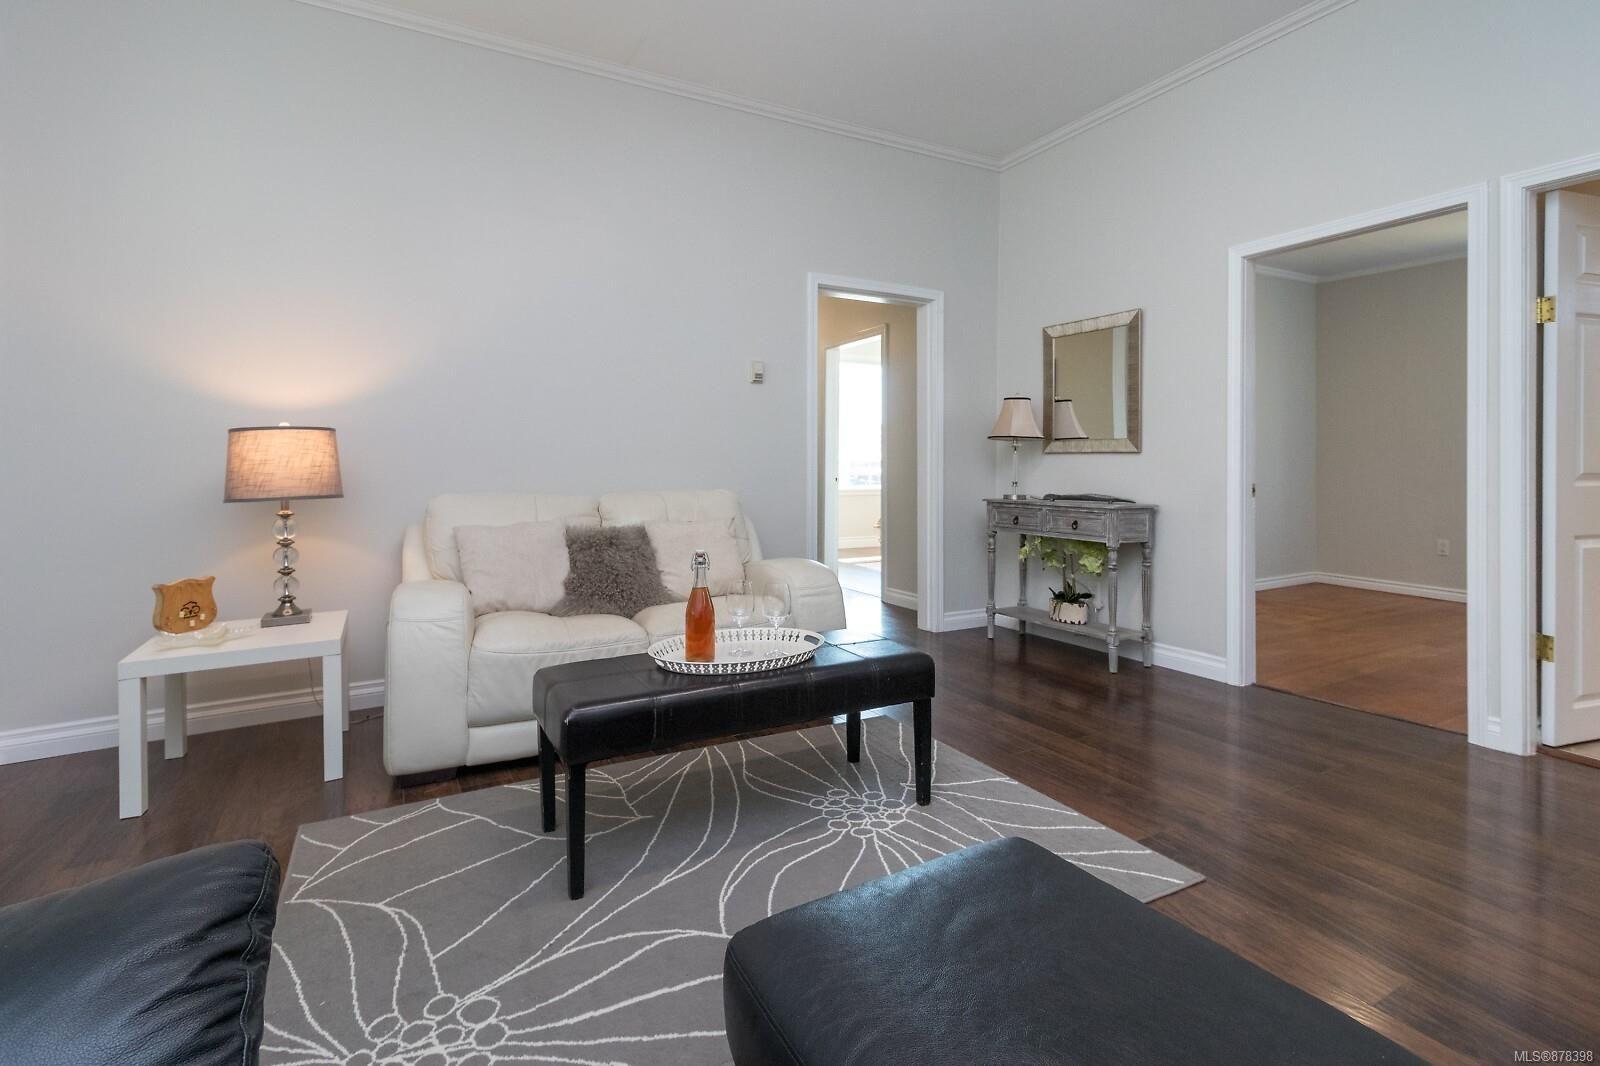 Main Photo: 524 Constance Ave in : Es Esquimalt House for sale (Esquimalt)  : MLS®# 878398